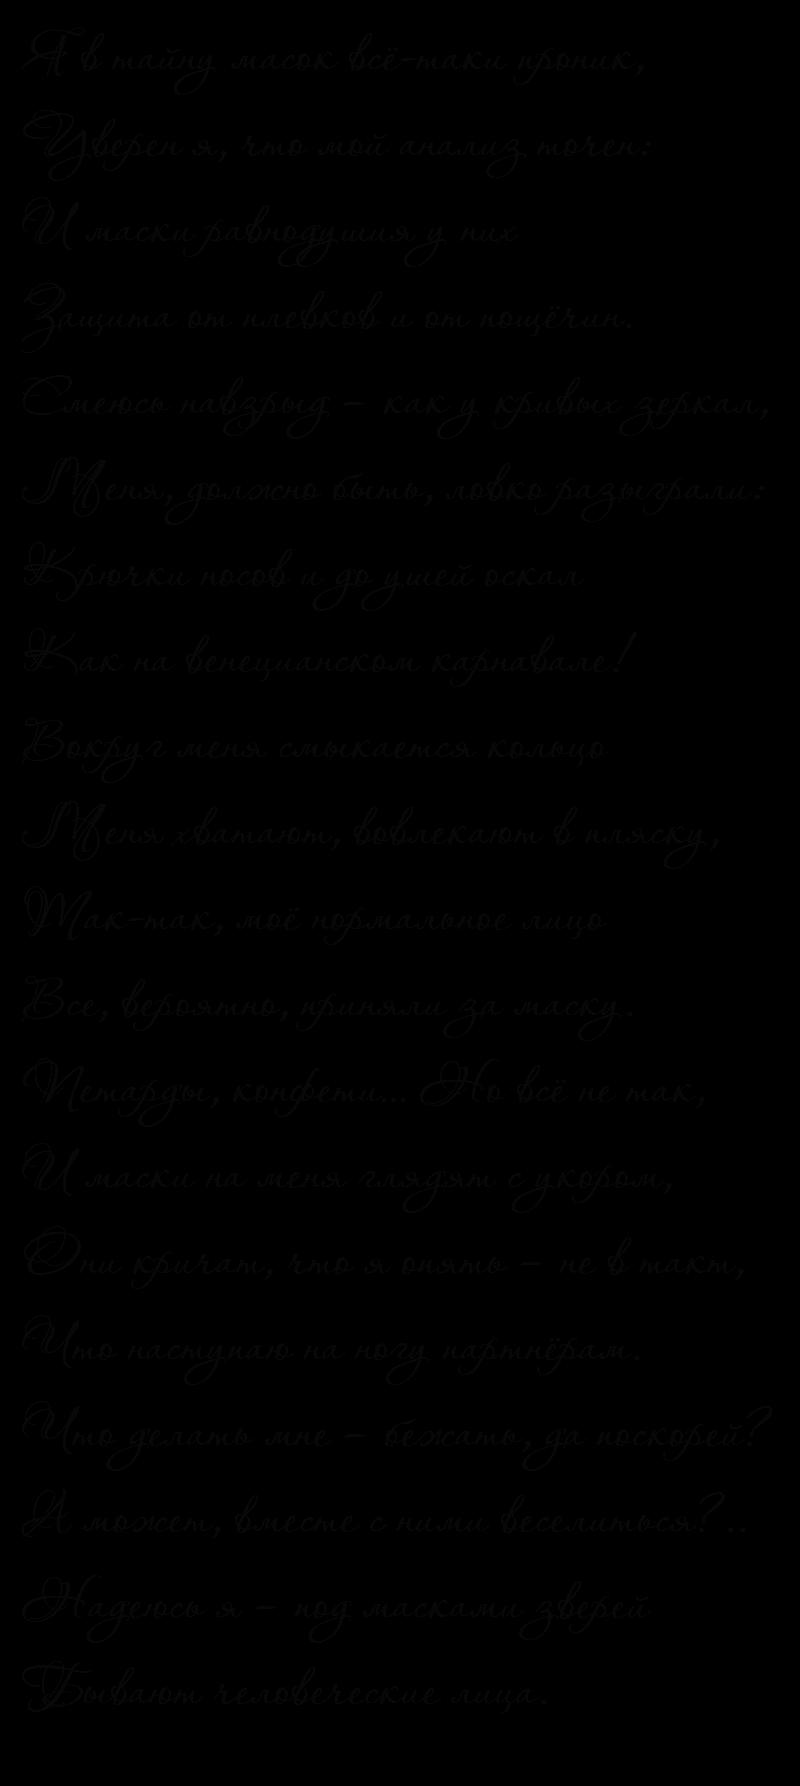 http://s2.uploads.ru/So9Ub.png